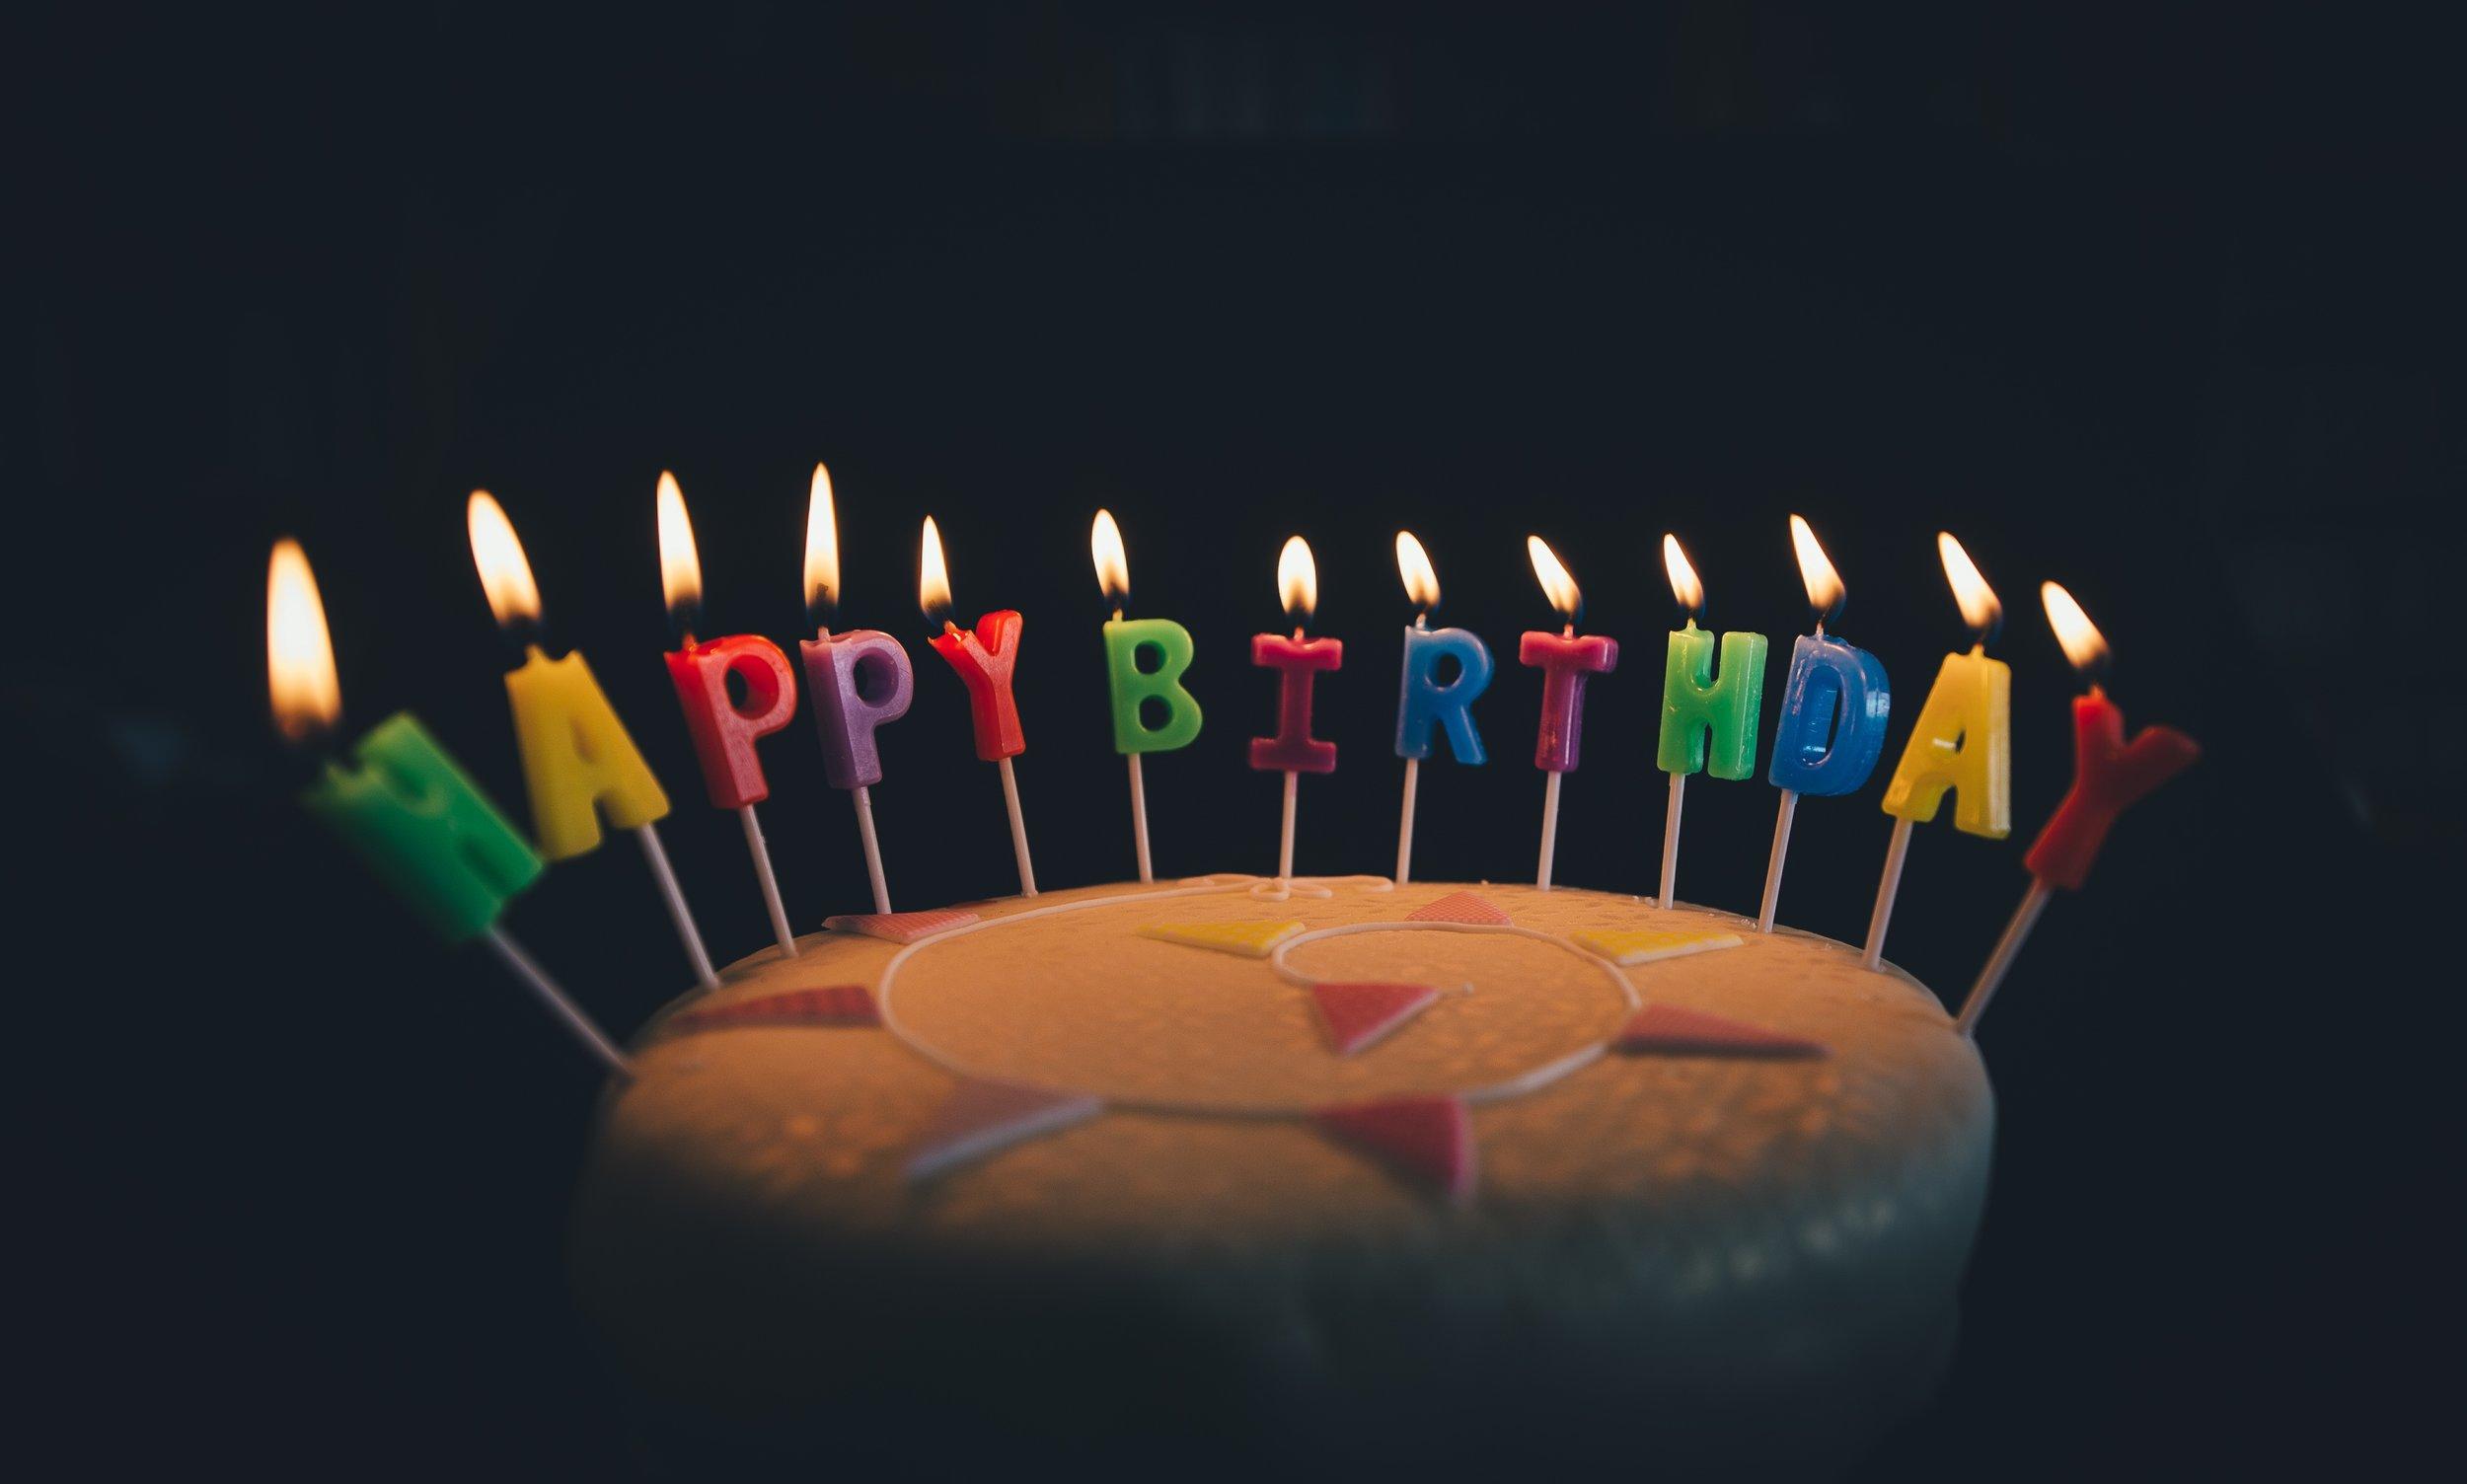 birthday-birthday-cake-cake-candles-fire-flame-1367387-pxhere.com.jpg